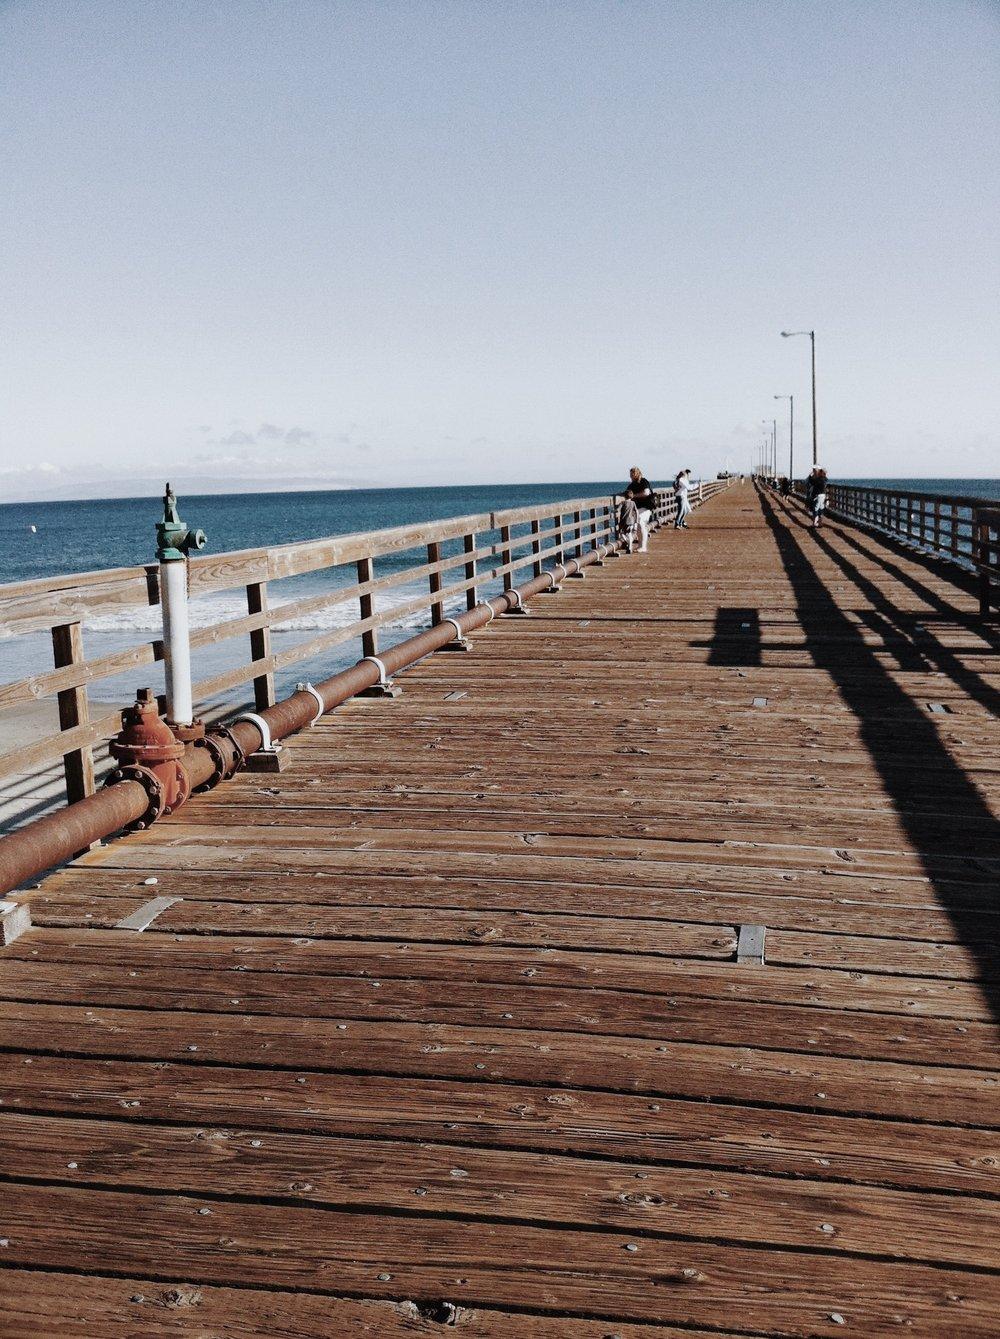 Enjoy a walk in the sand or on the pier at Avila Beach.